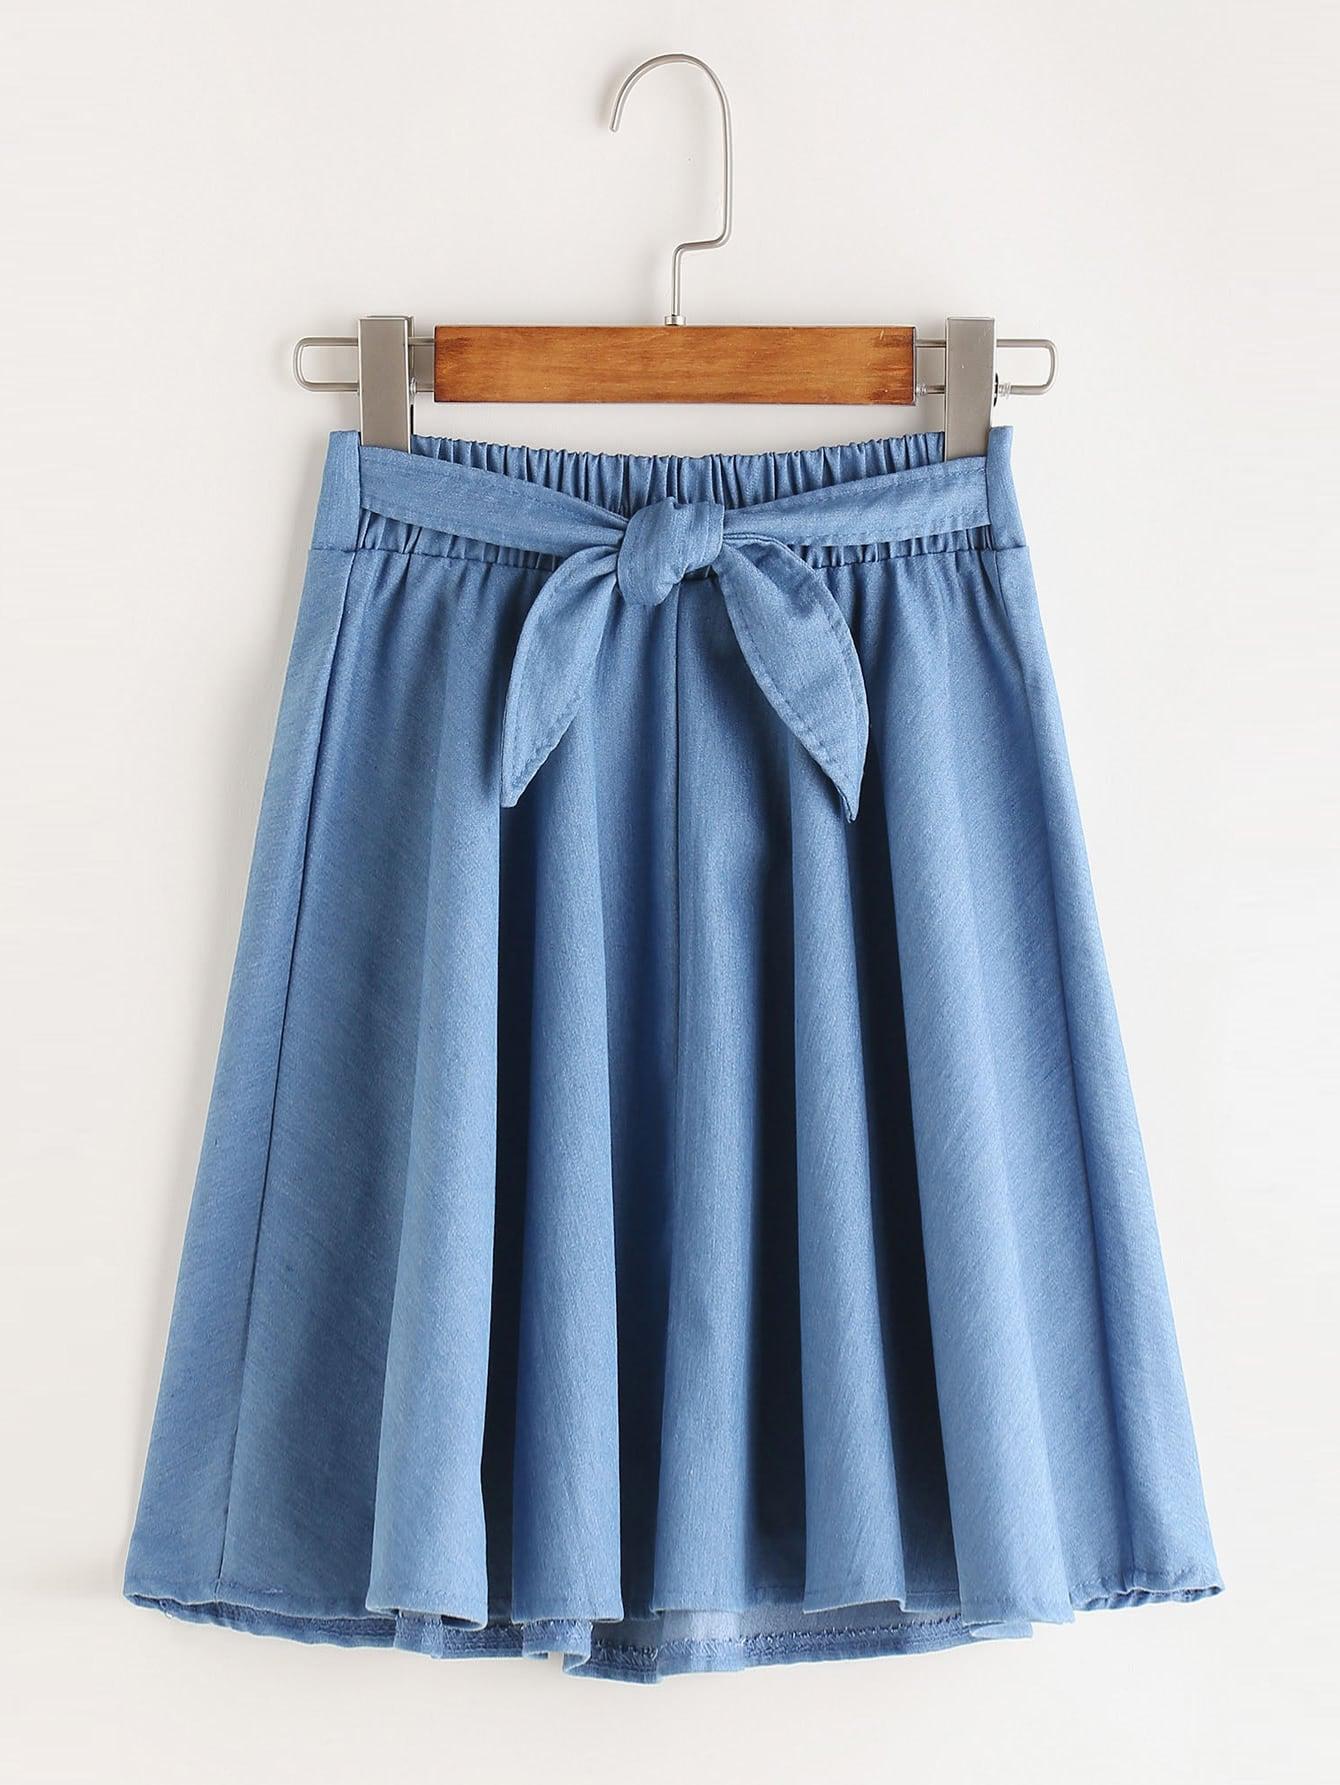 Shirred Tie Waist Pleated A Line Skirt